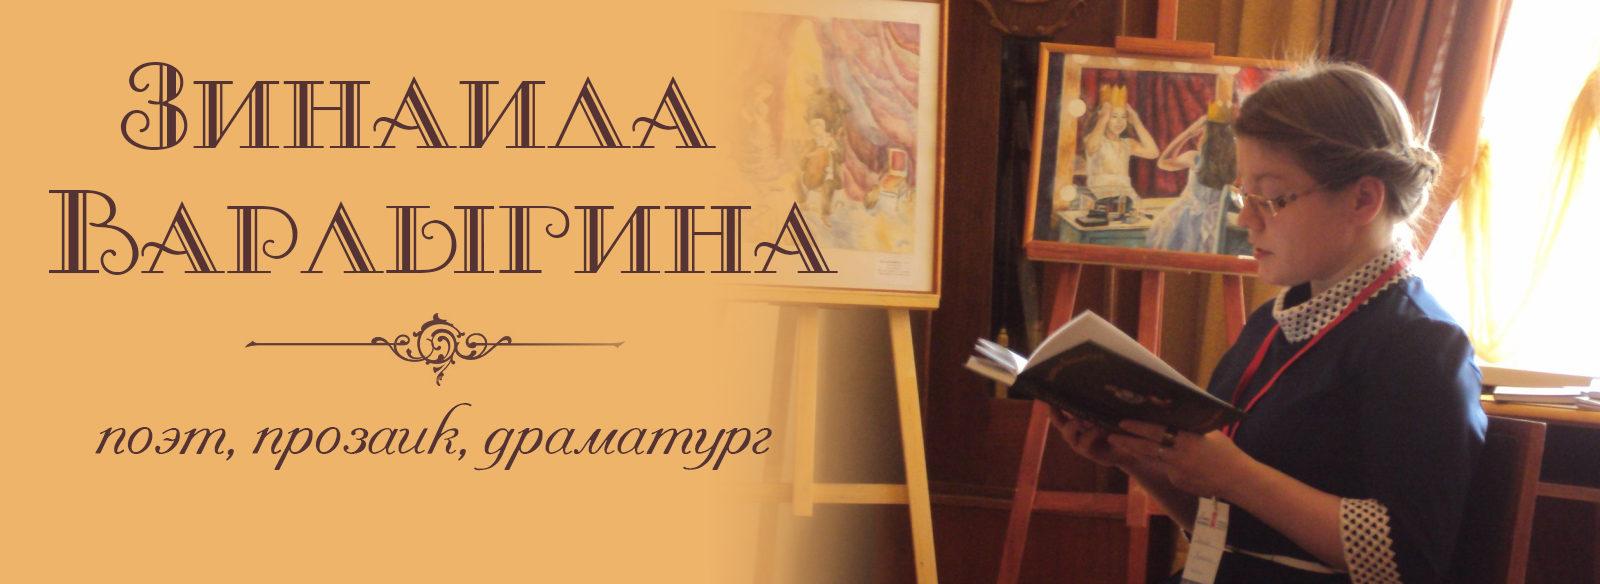 Зинаида Варлыгина